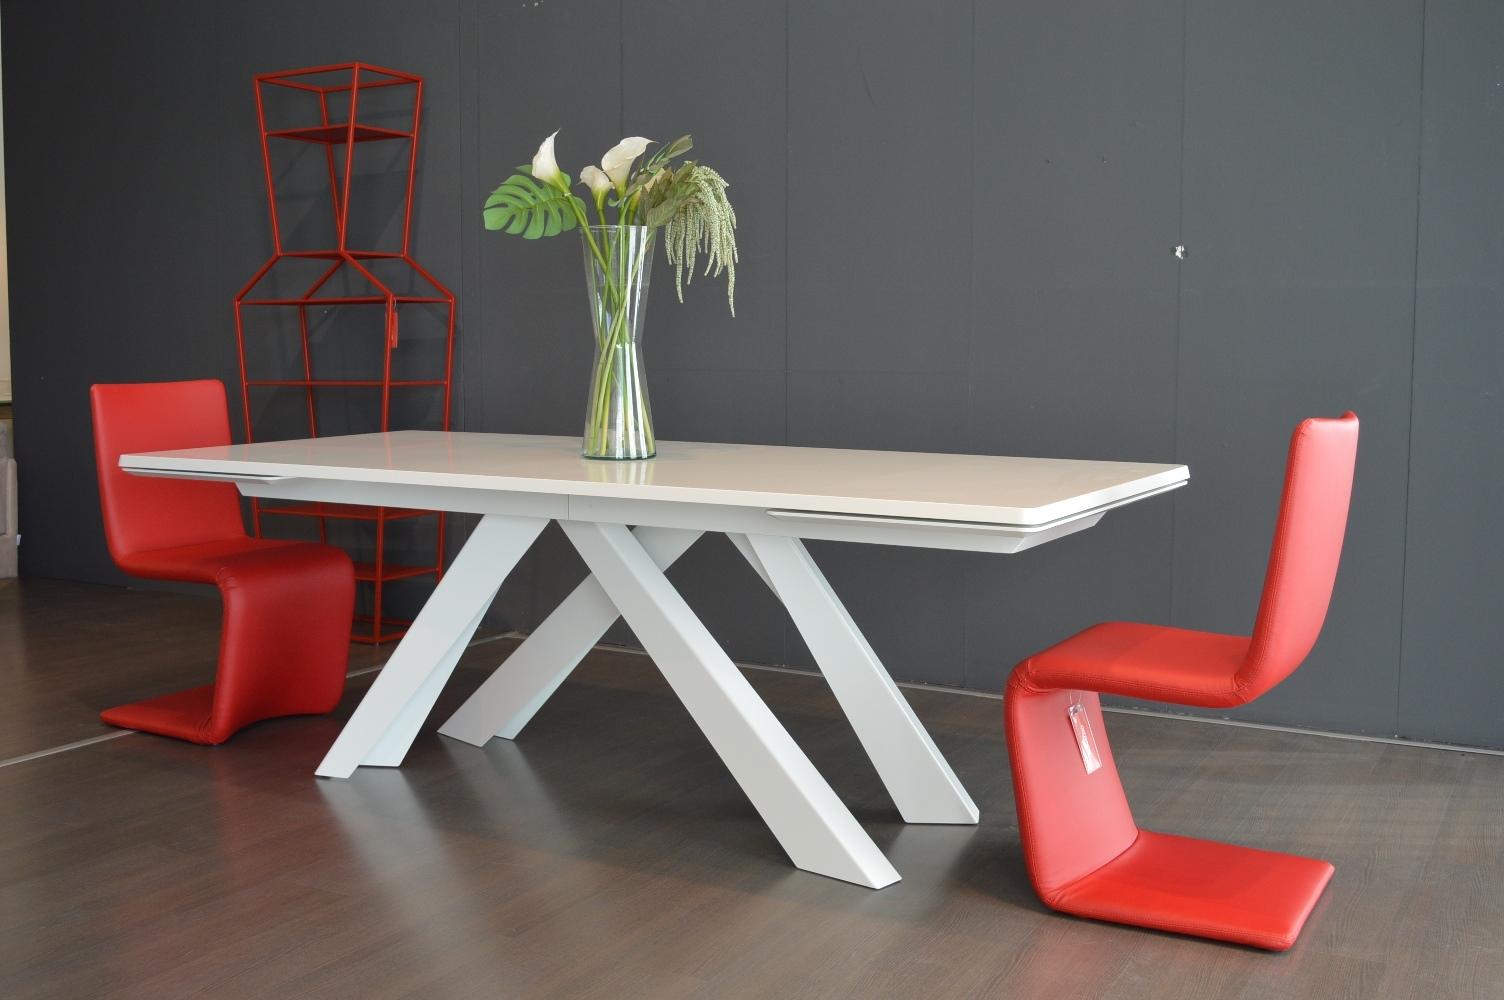 tavolo bonaldo big table allungabile tavoli a prezzi scontati. Black Bedroom Furniture Sets. Home Design Ideas